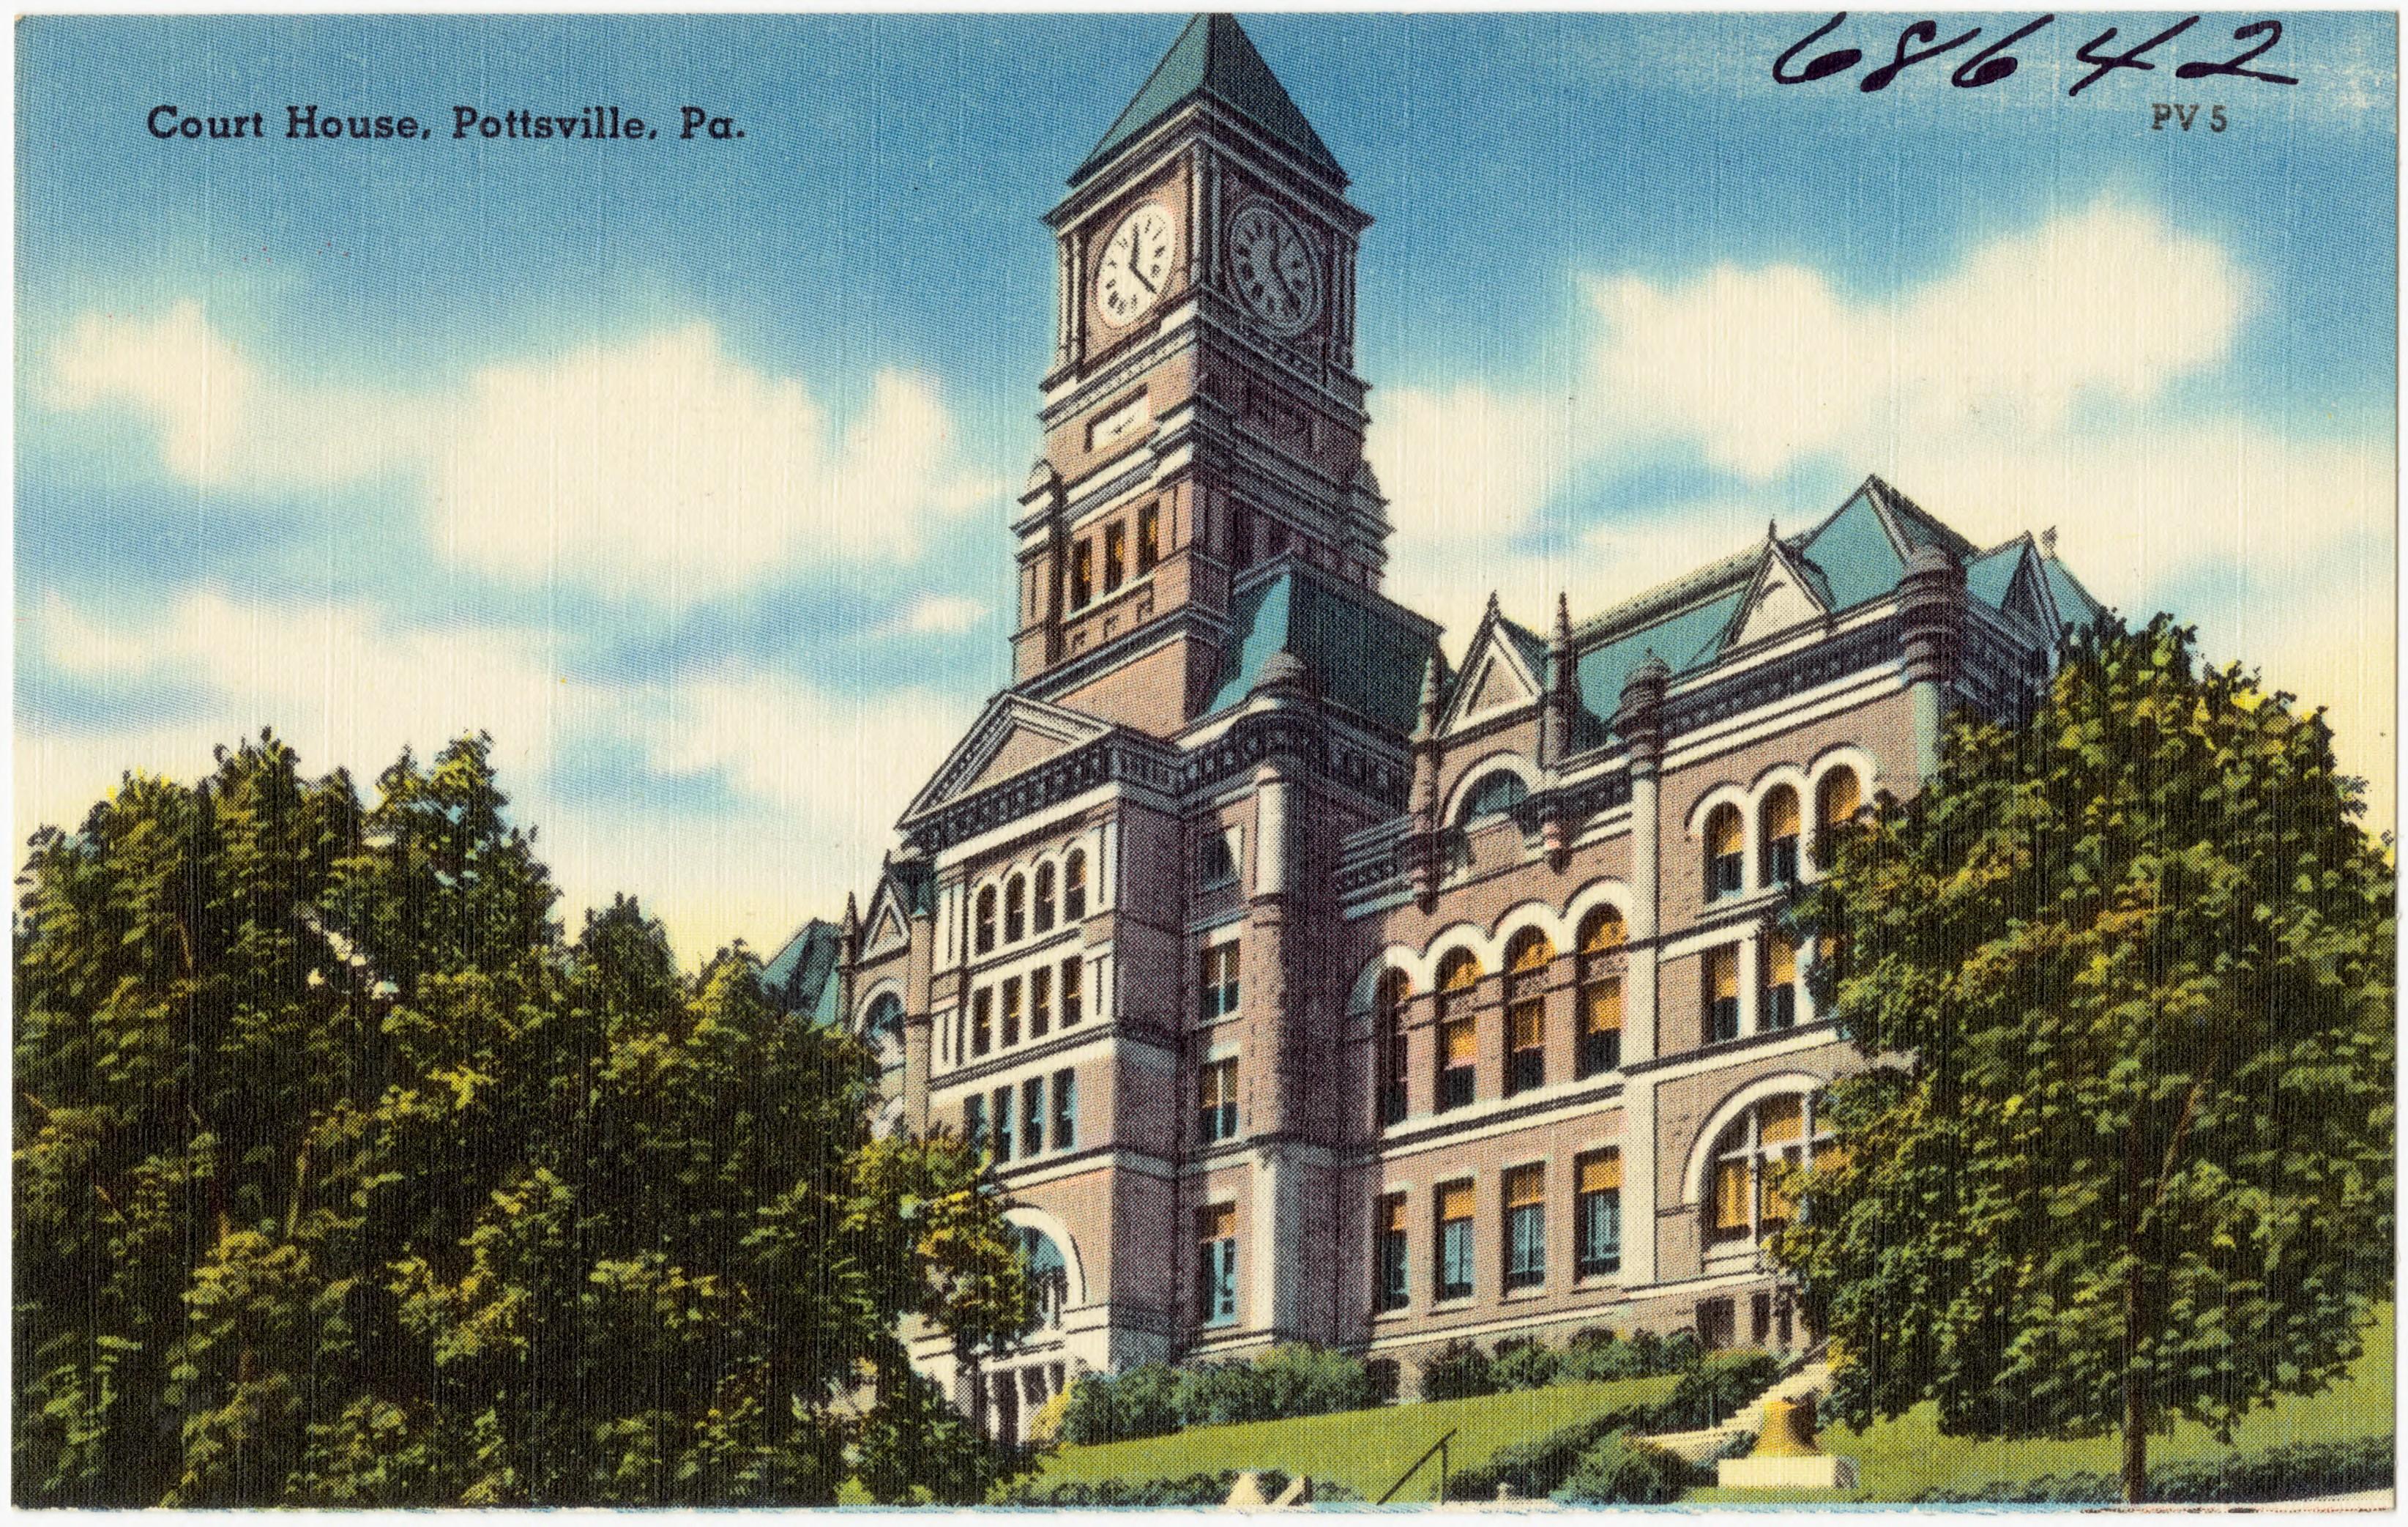 Pottsville PA dating